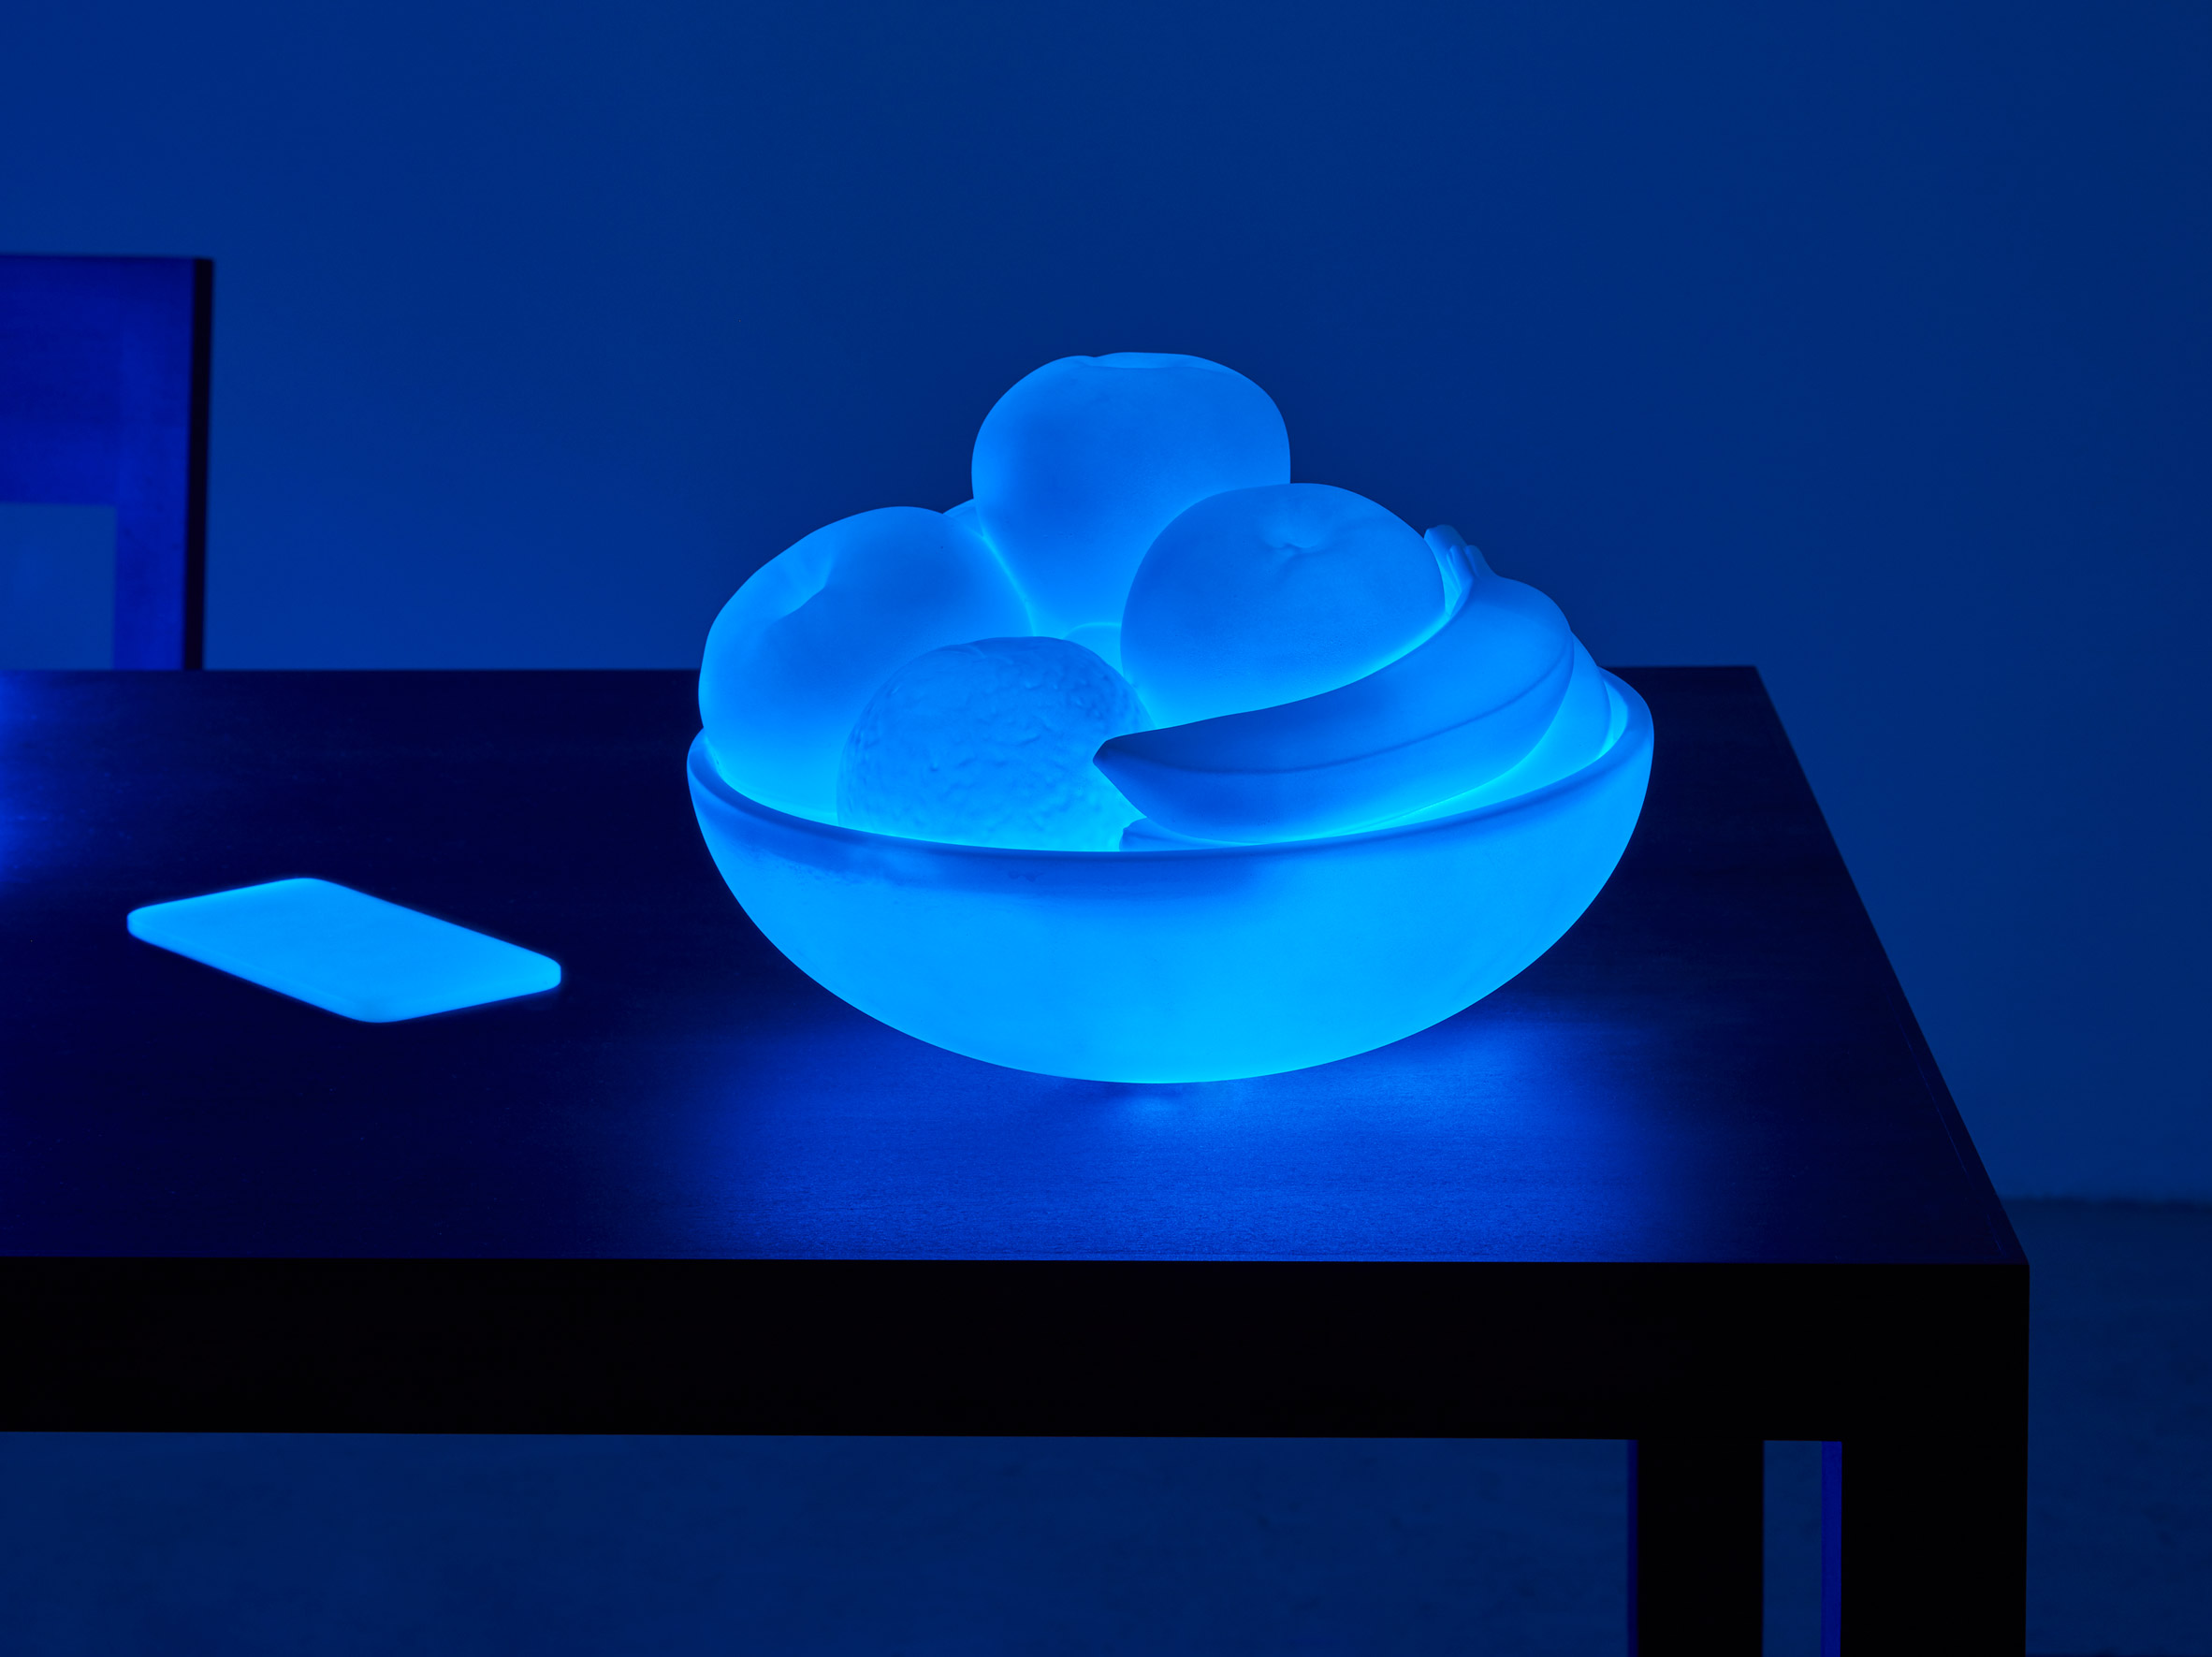 Return to the Real, Doug Aitken's exhibition